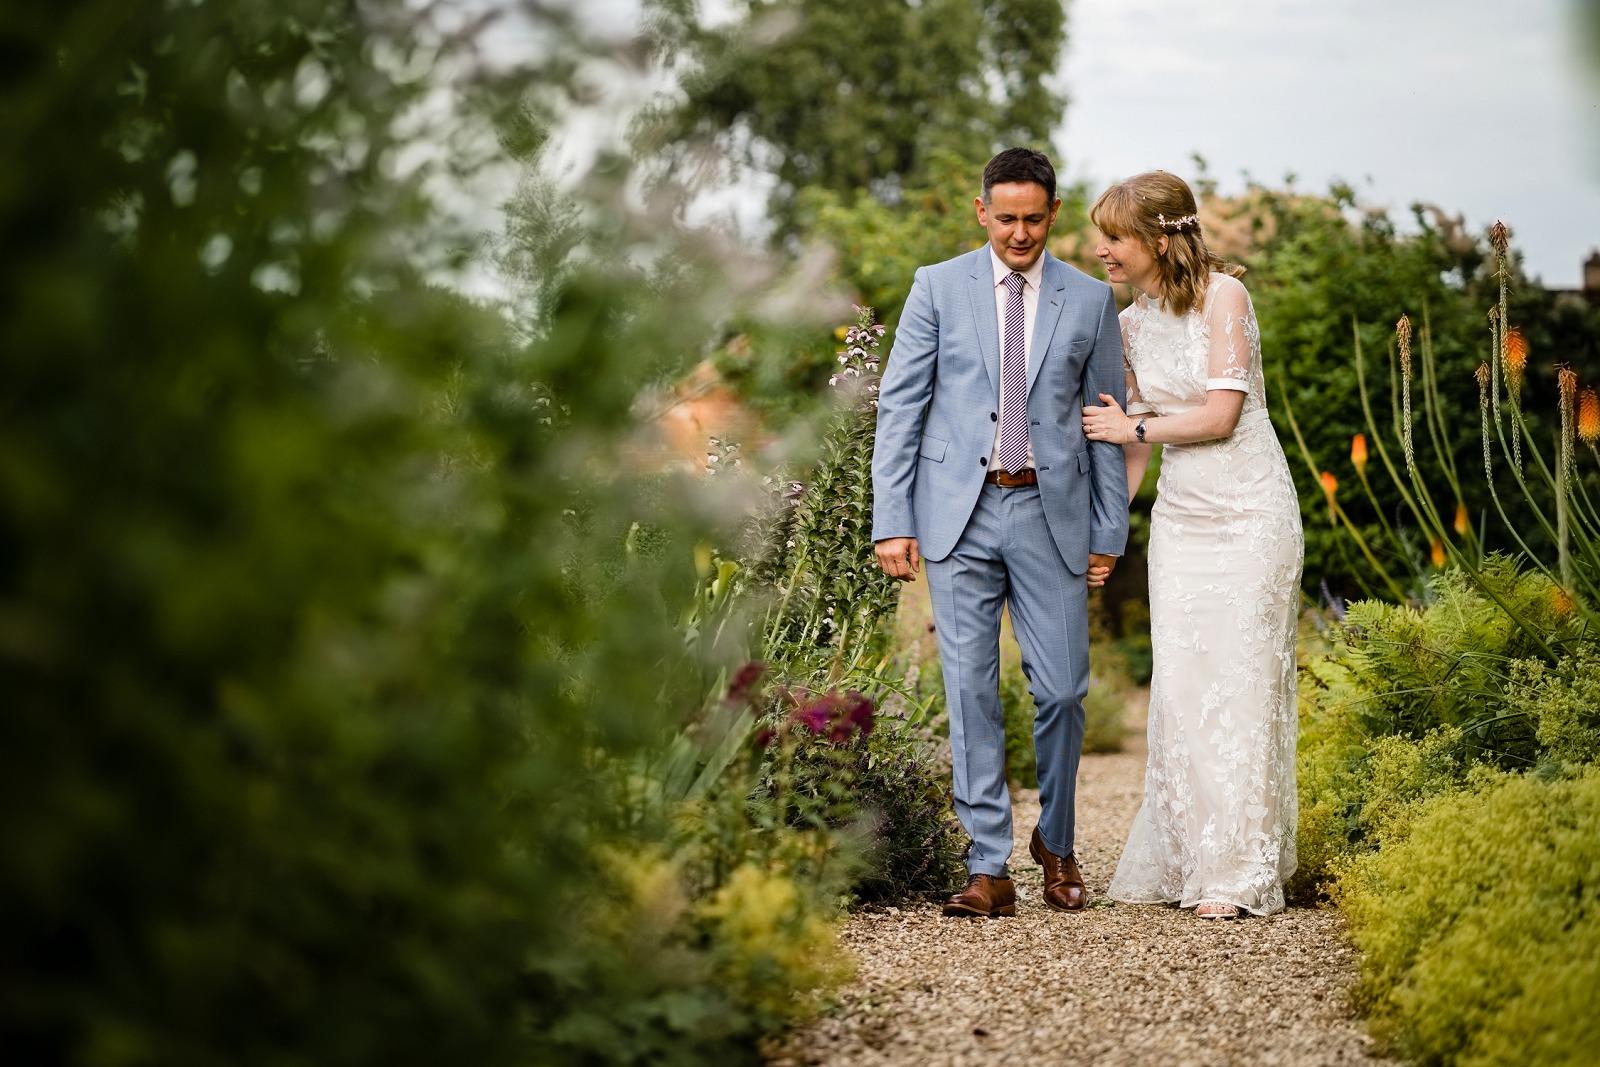 kelly wedding at the four season hotel hampshire